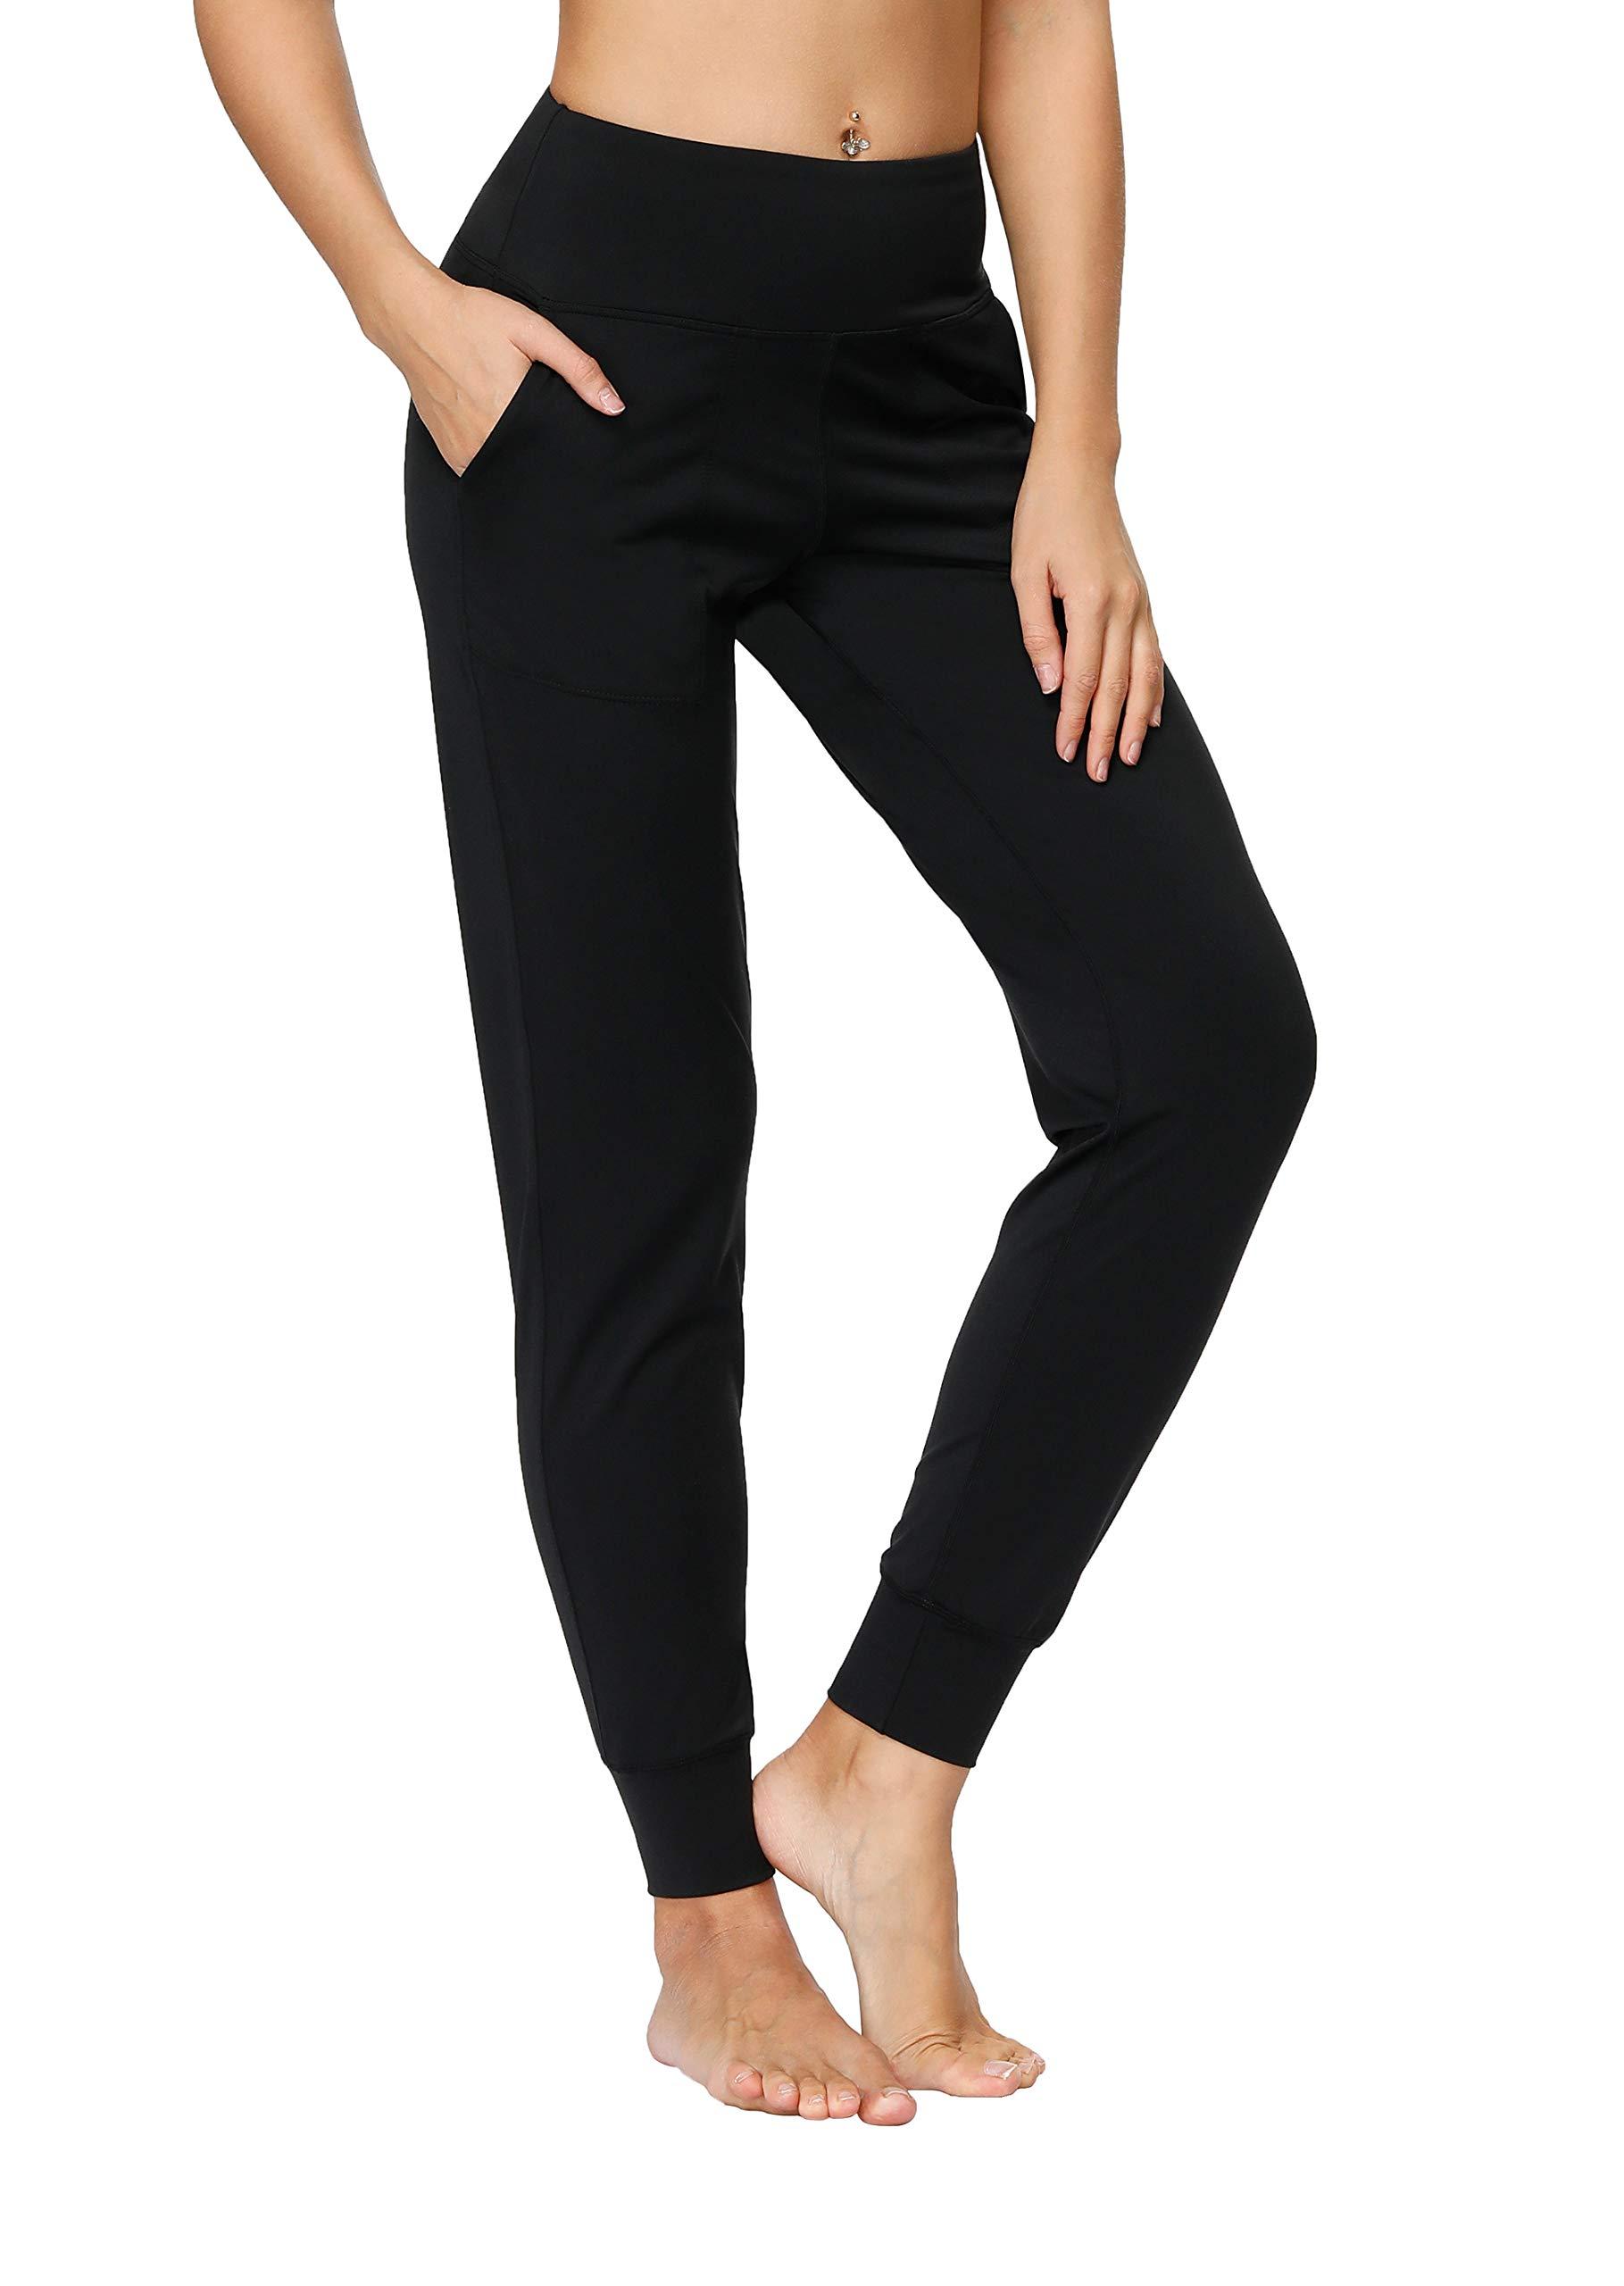 Tsuretobe Womens Joggers Pants with Pockets High Waist Active Yoga Sweatpants Workout Tapered Lounge Pants